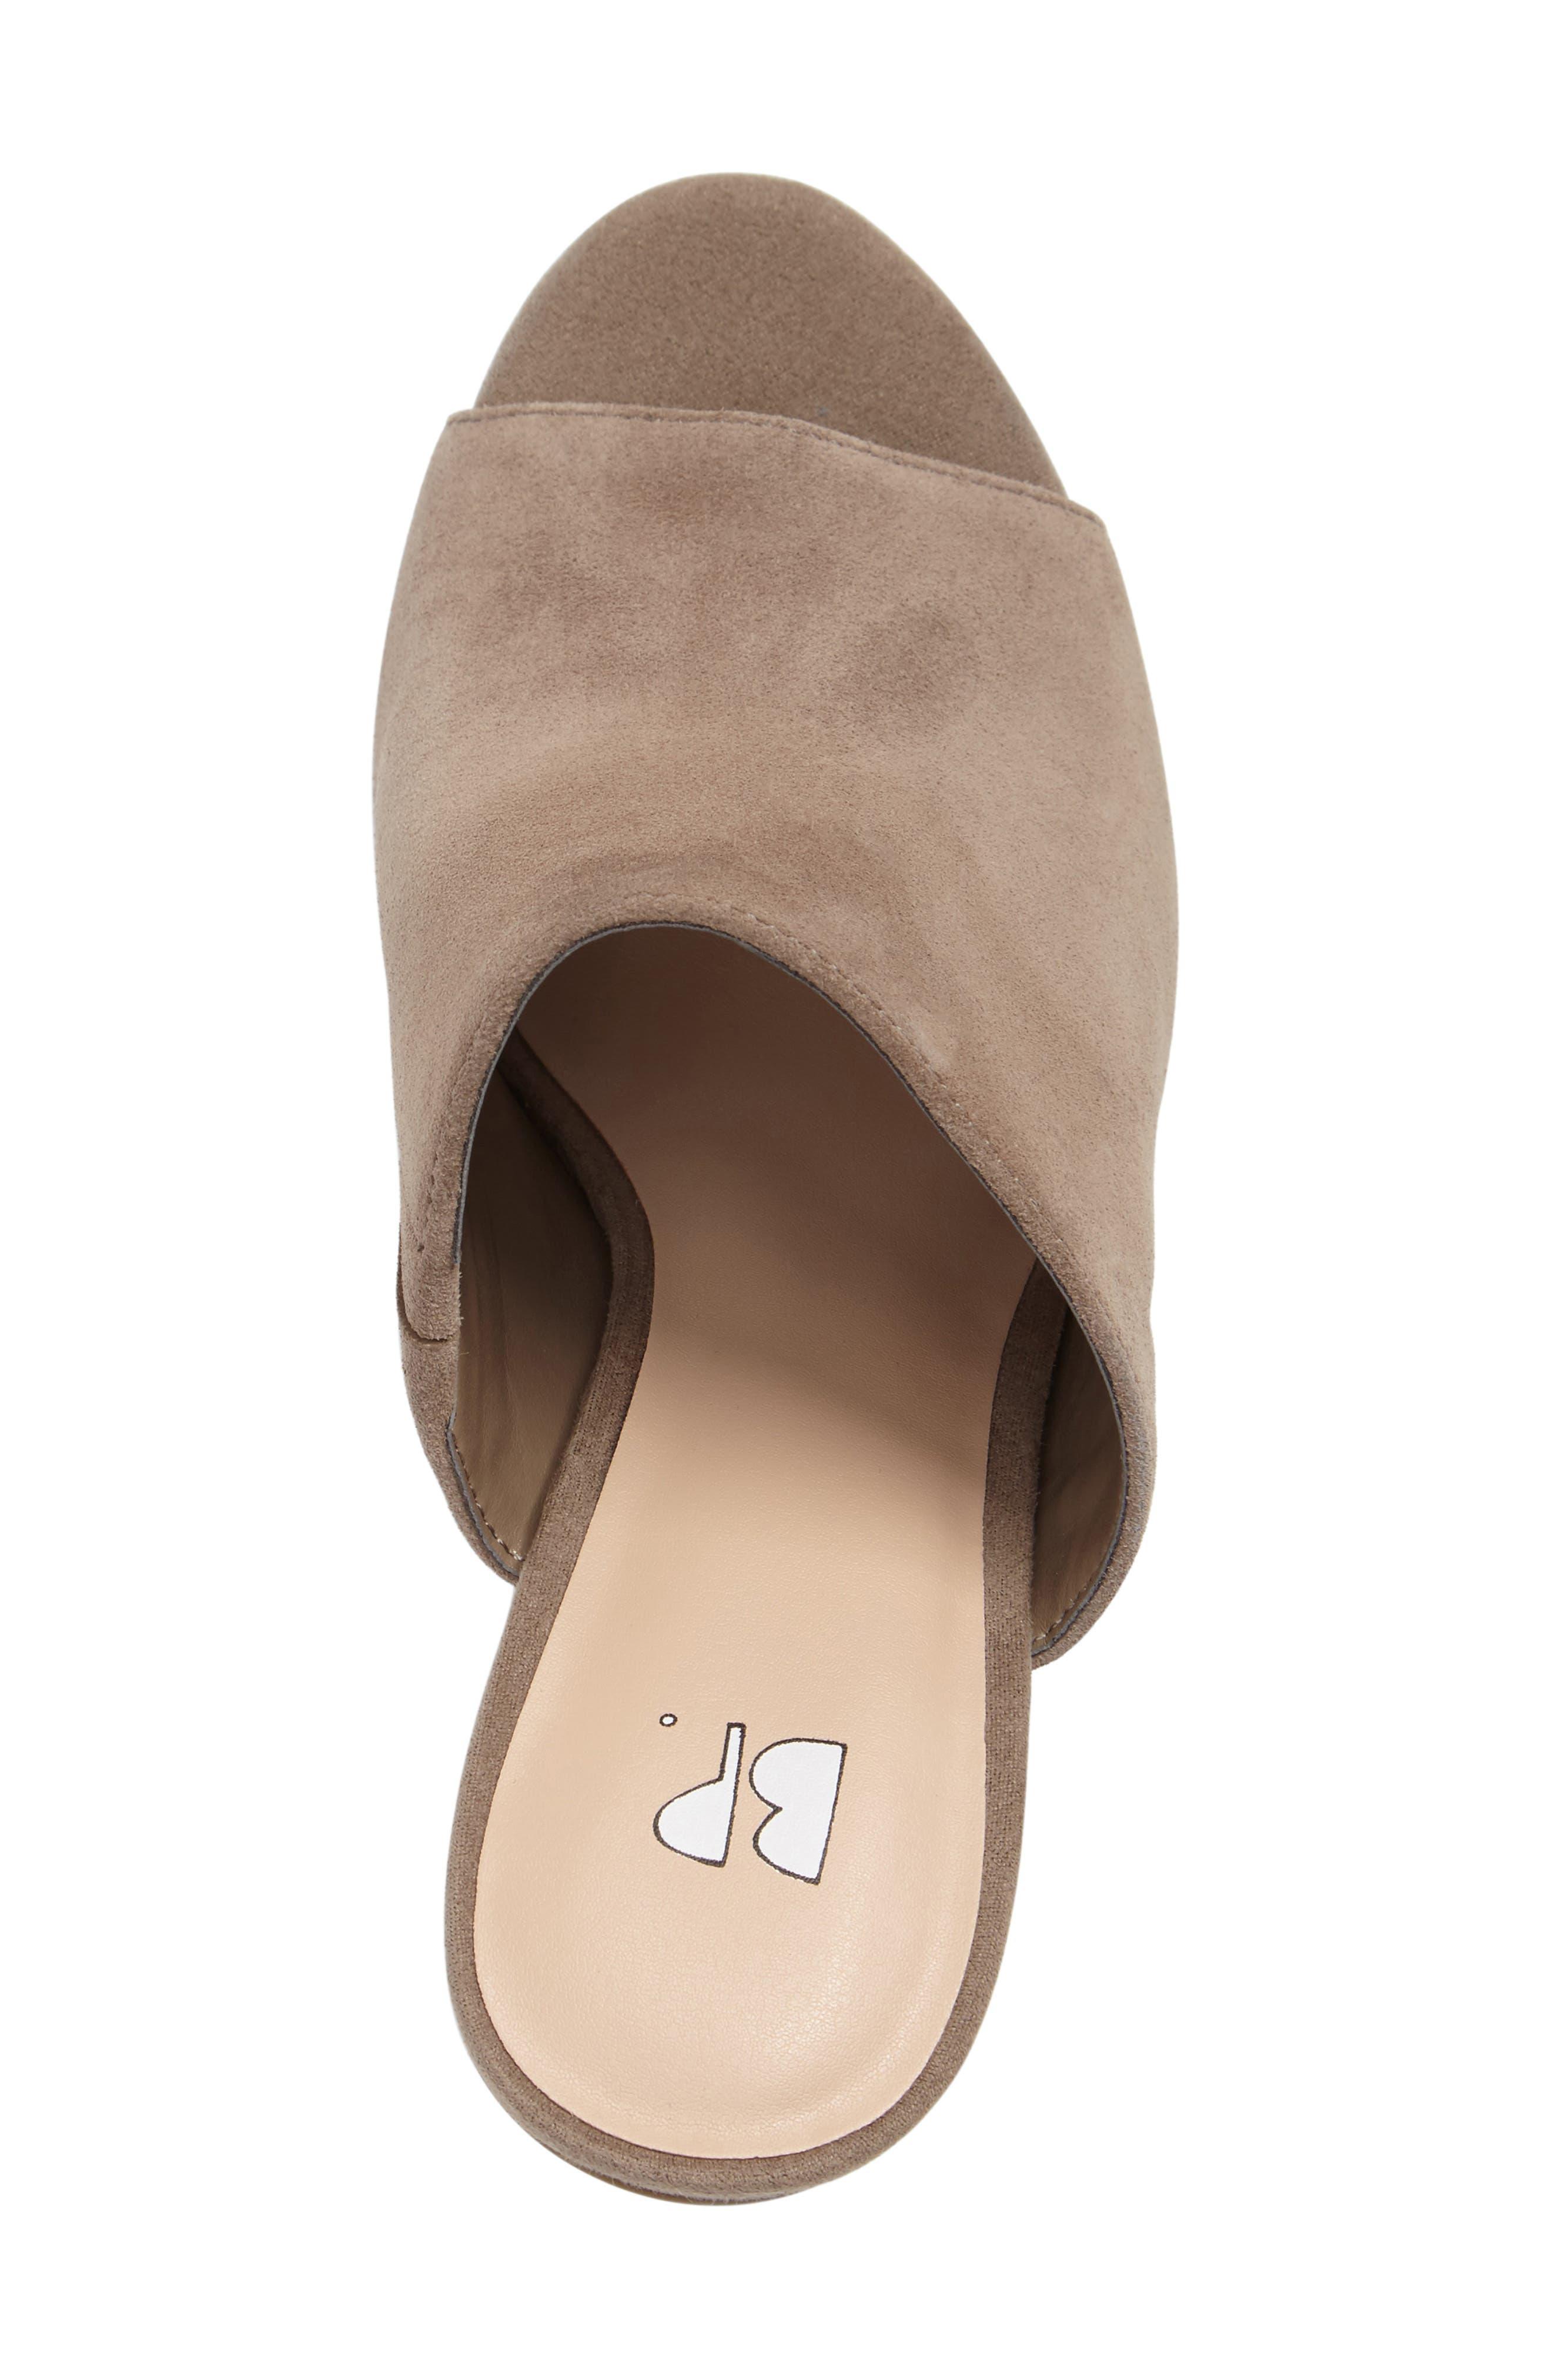 Tale Block Heel Sandal,                             Alternate thumbnail 6, color,